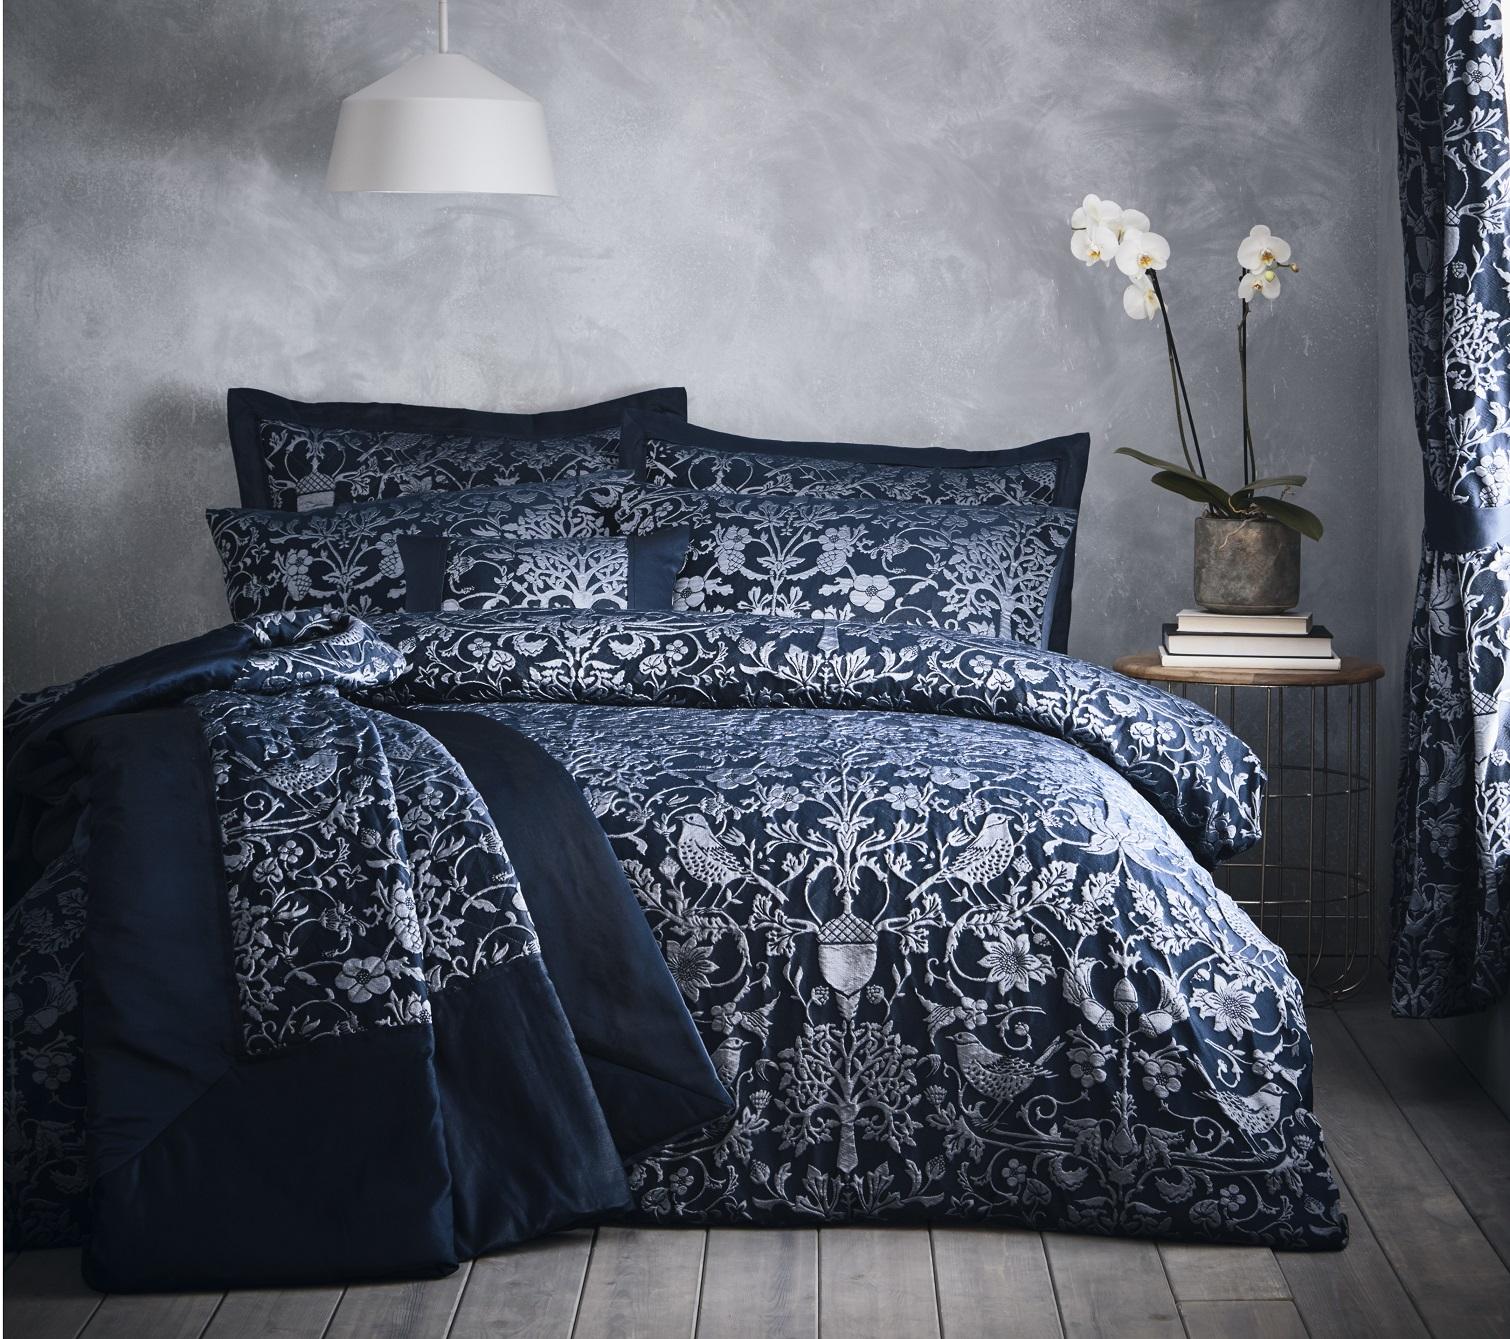 details about oak tree navy blue duvet cover jacquard floral bird double bed quilt bedding set